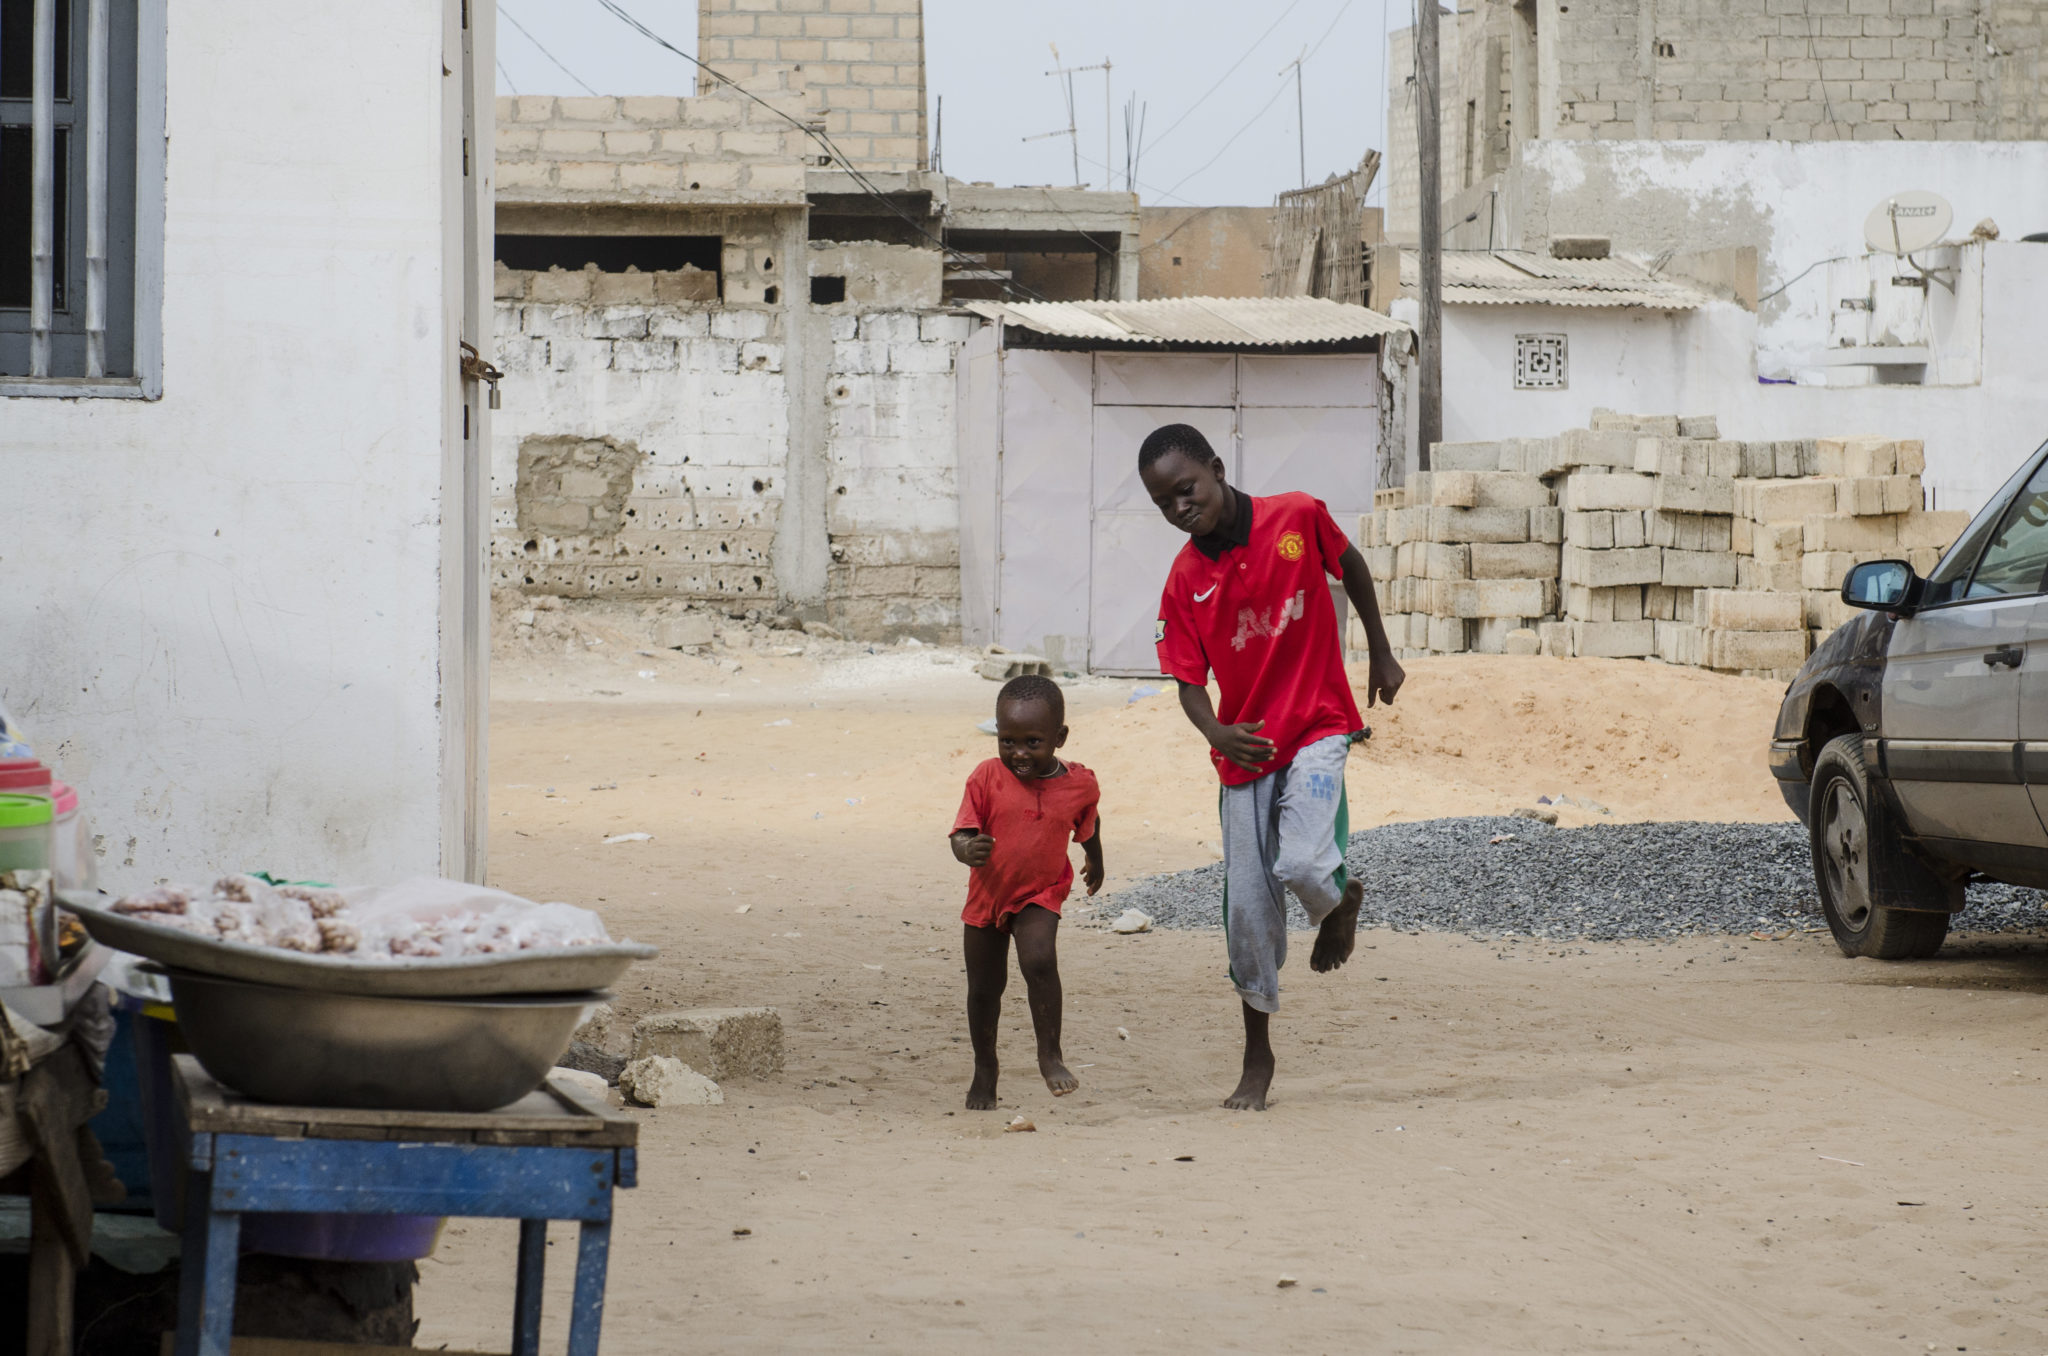 Mbour-Petite-Cote-Senegal-kids-street